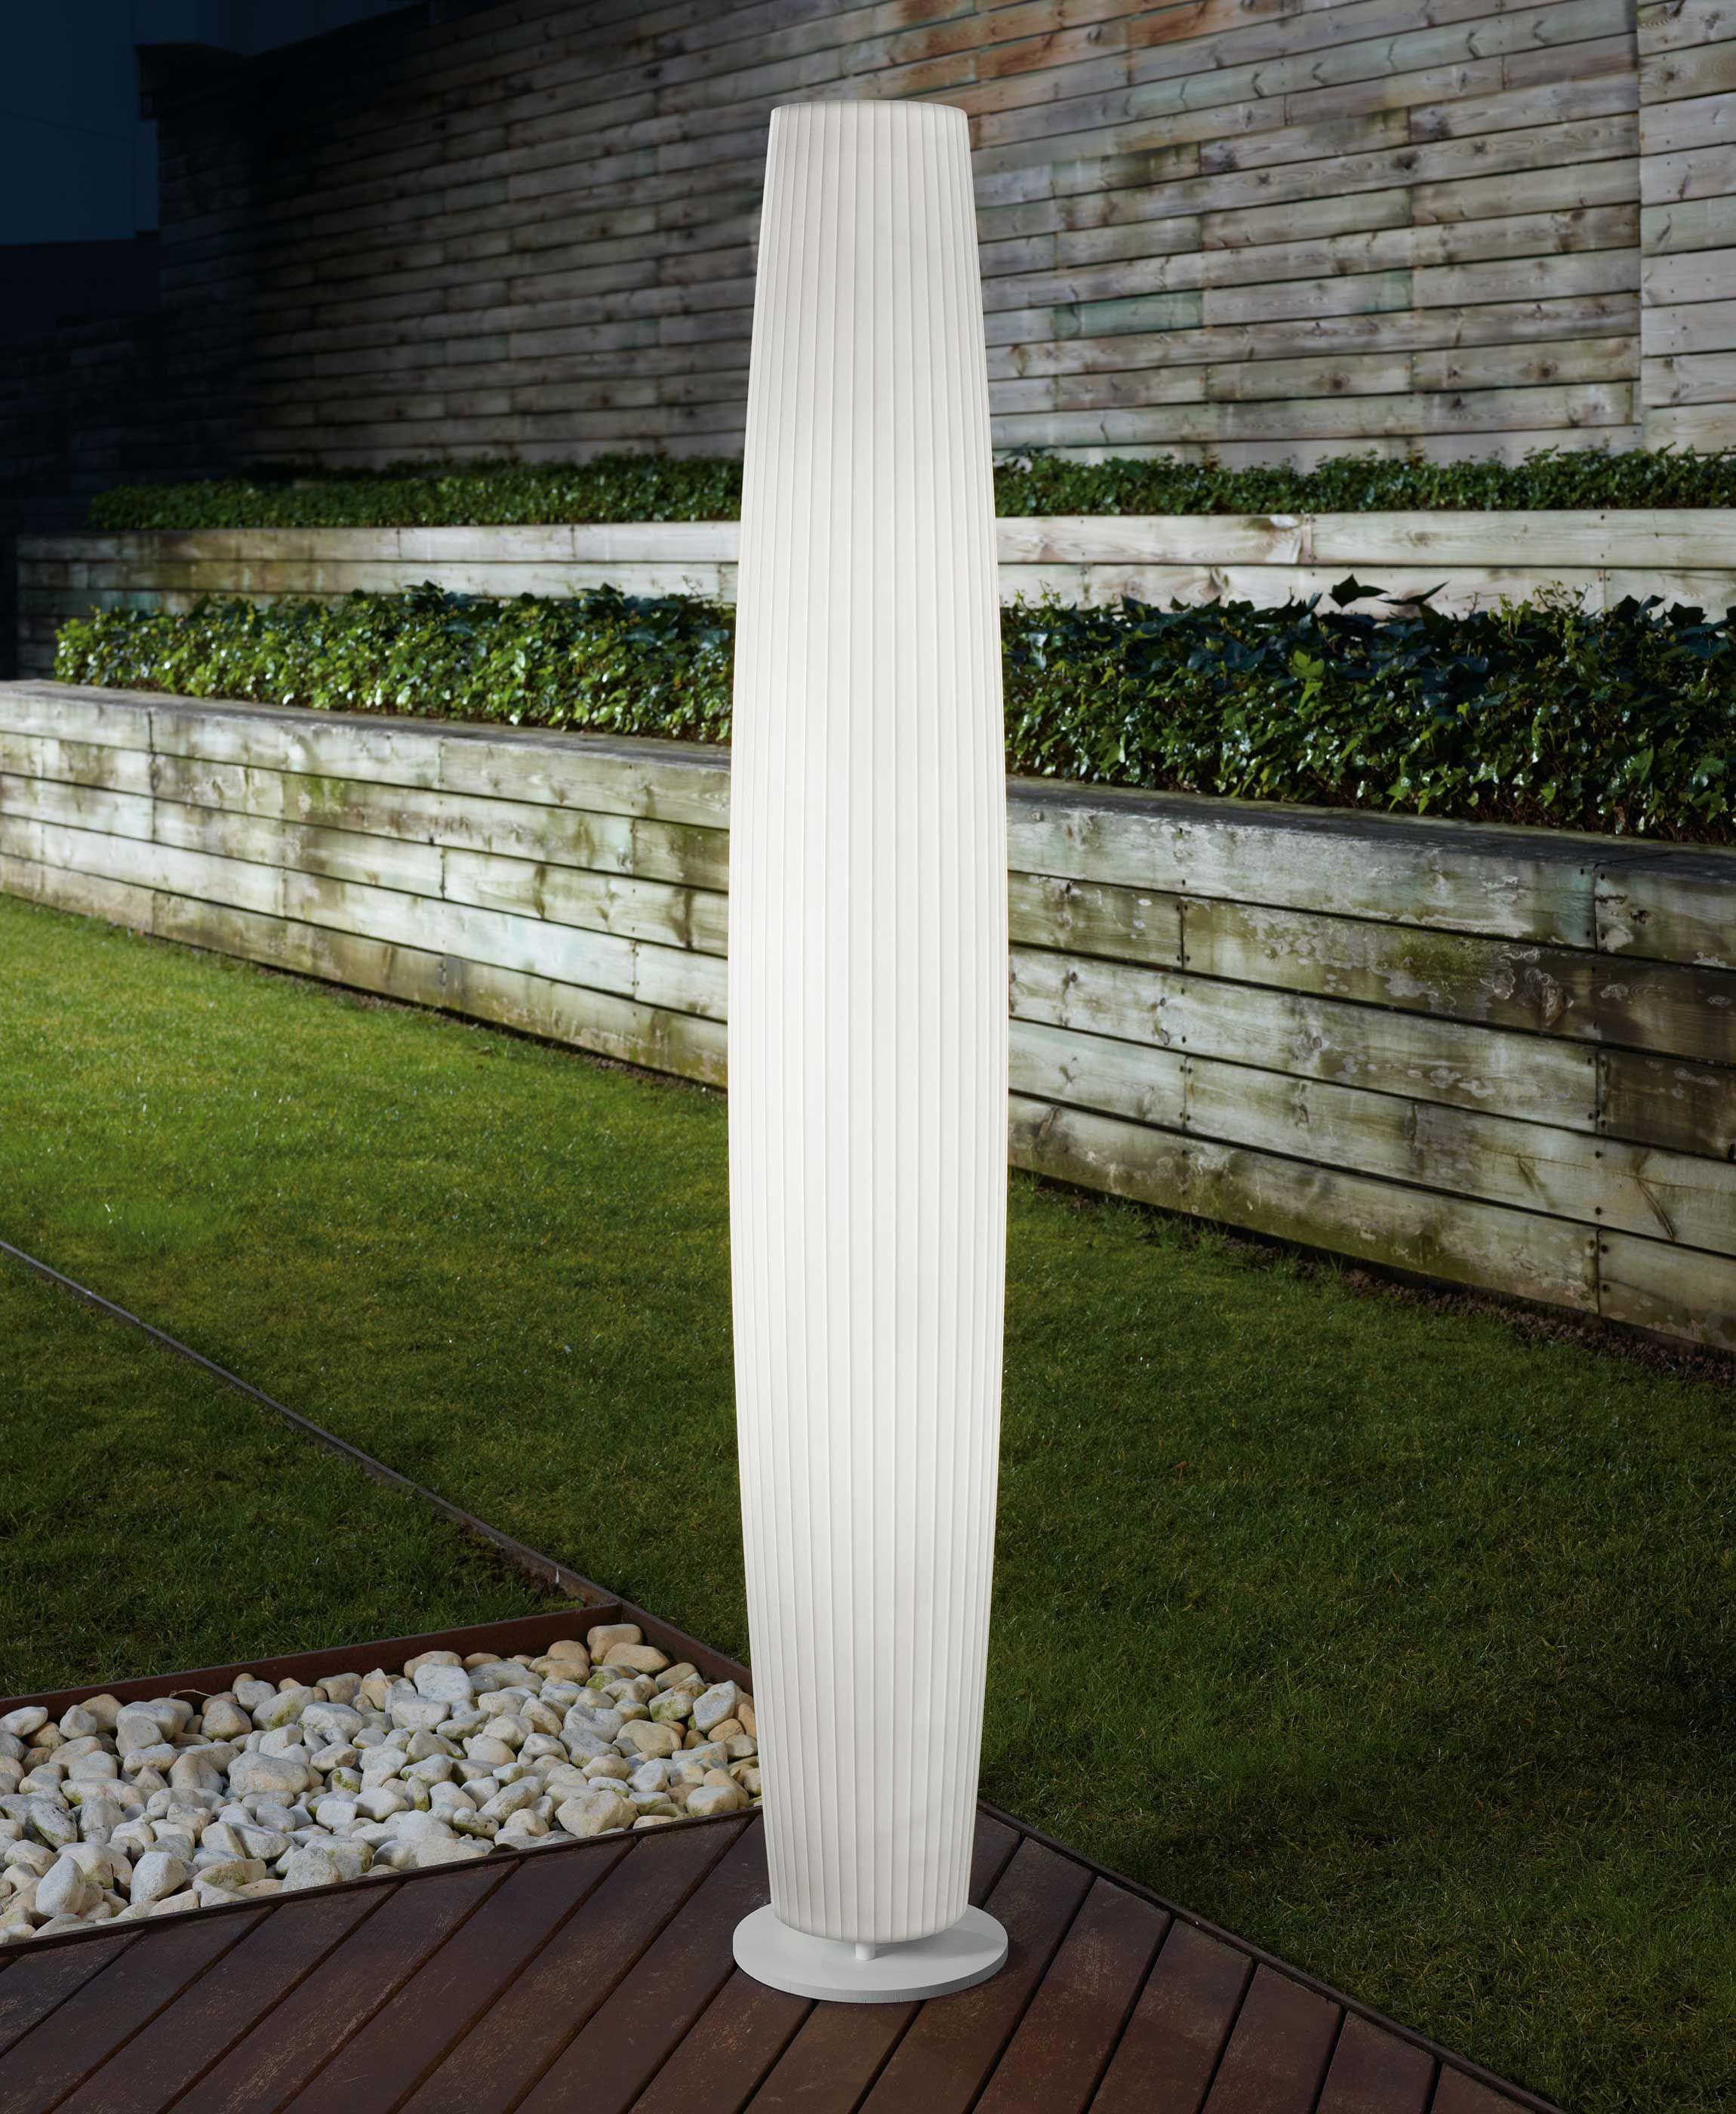 Maxi Outdoor Floor Lamp By Bover 3229500u Aussenboden